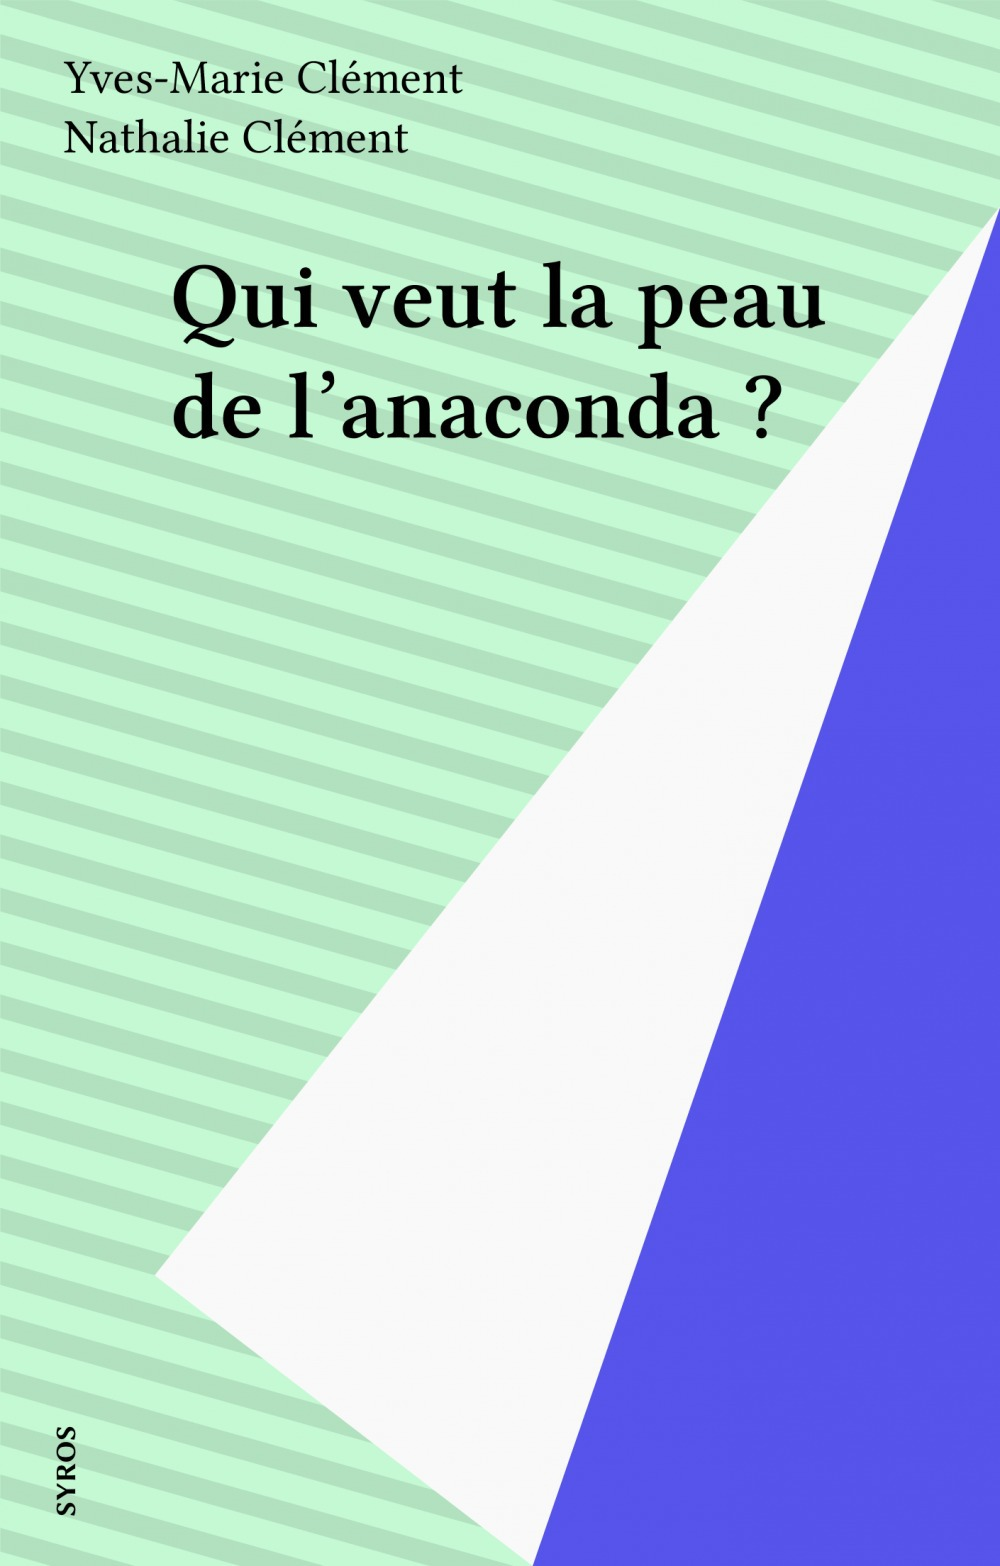 Qui veut la peau de l'anaconda